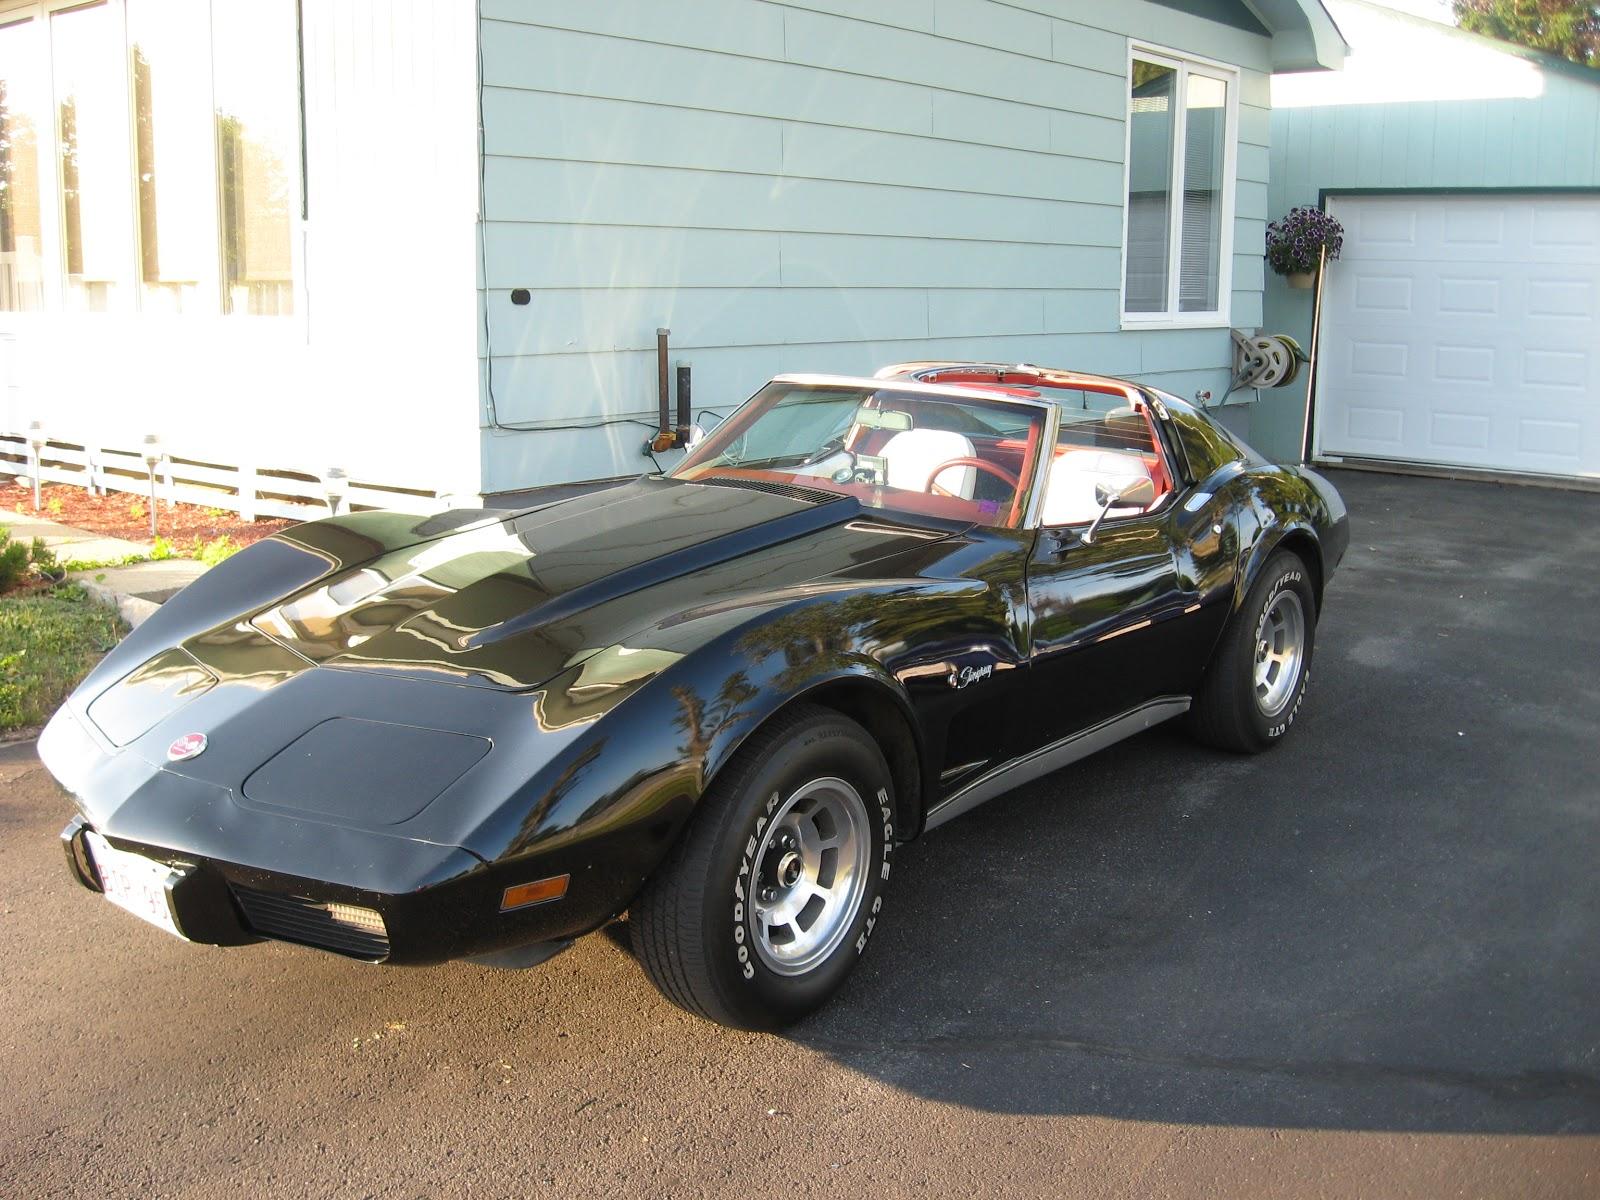 River Valley Vettes Corvette Club 1992 2018 1976 Corvette Stingray